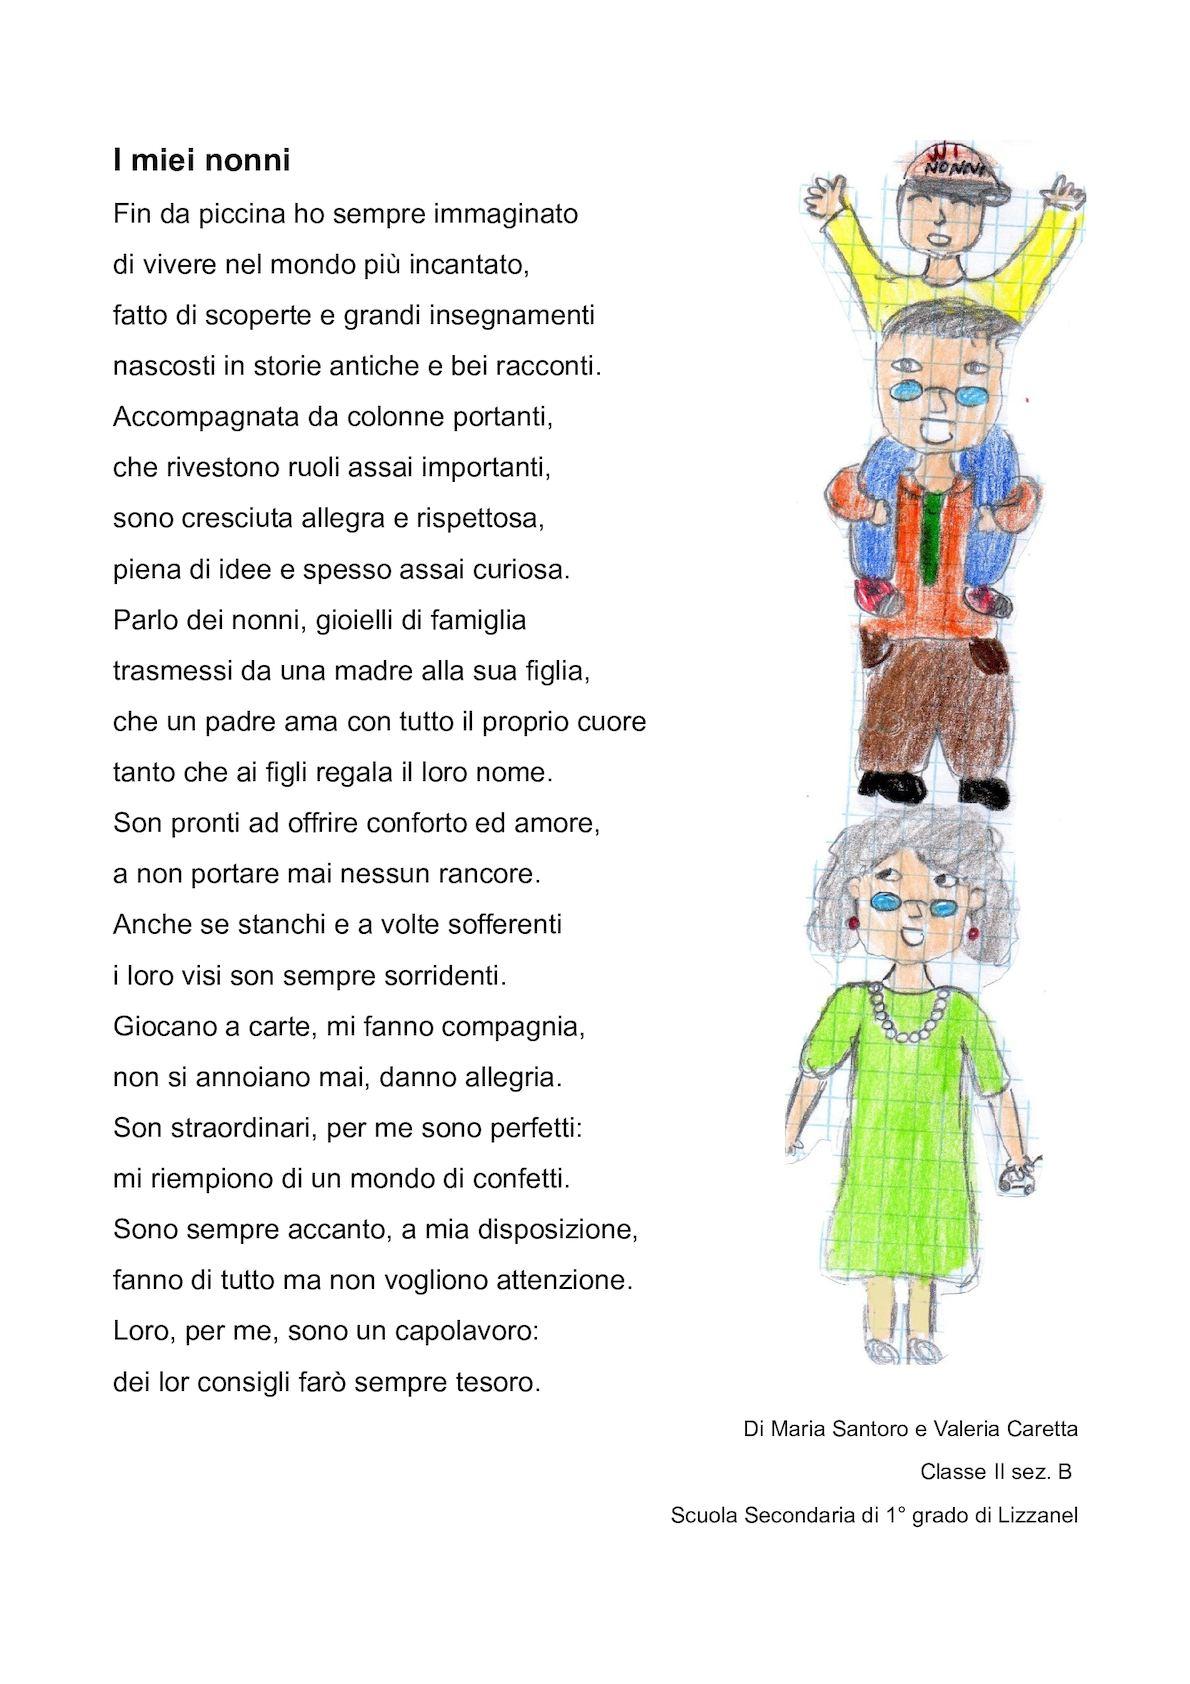 Top Calaméo - Poesie Nonni 2b ZX47